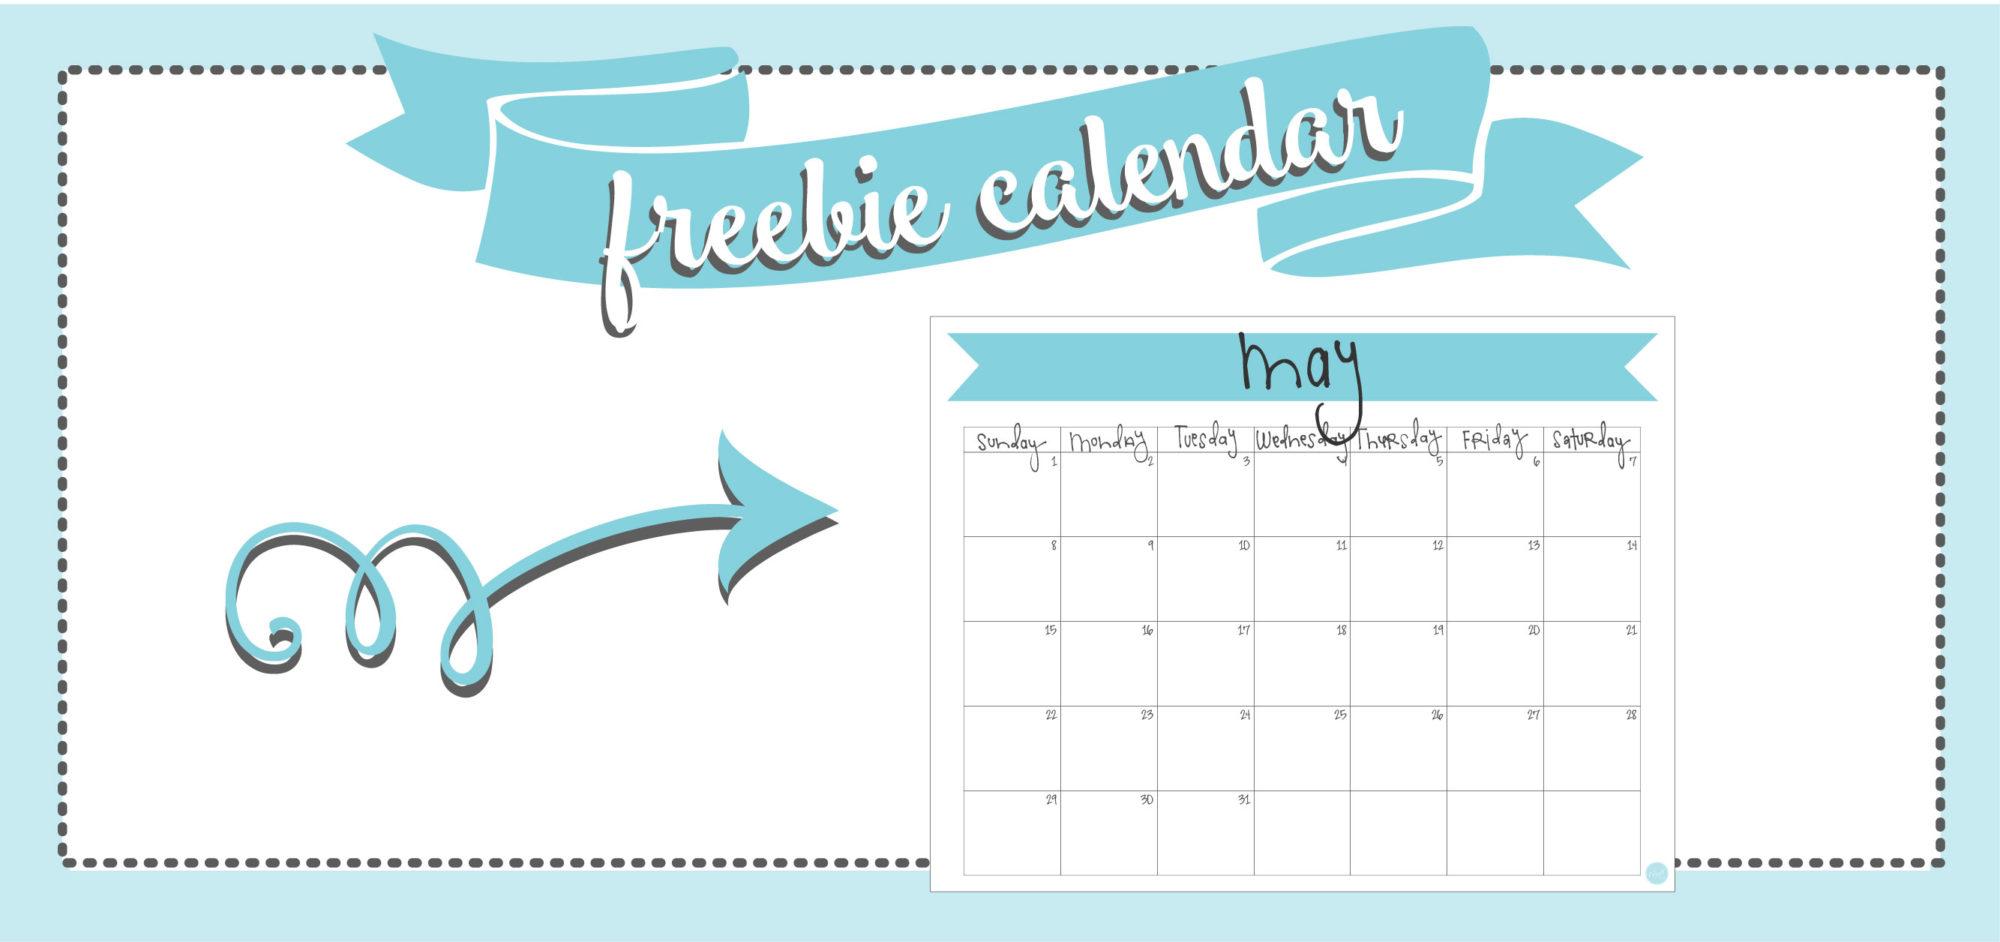 free printable calendars! may 2016